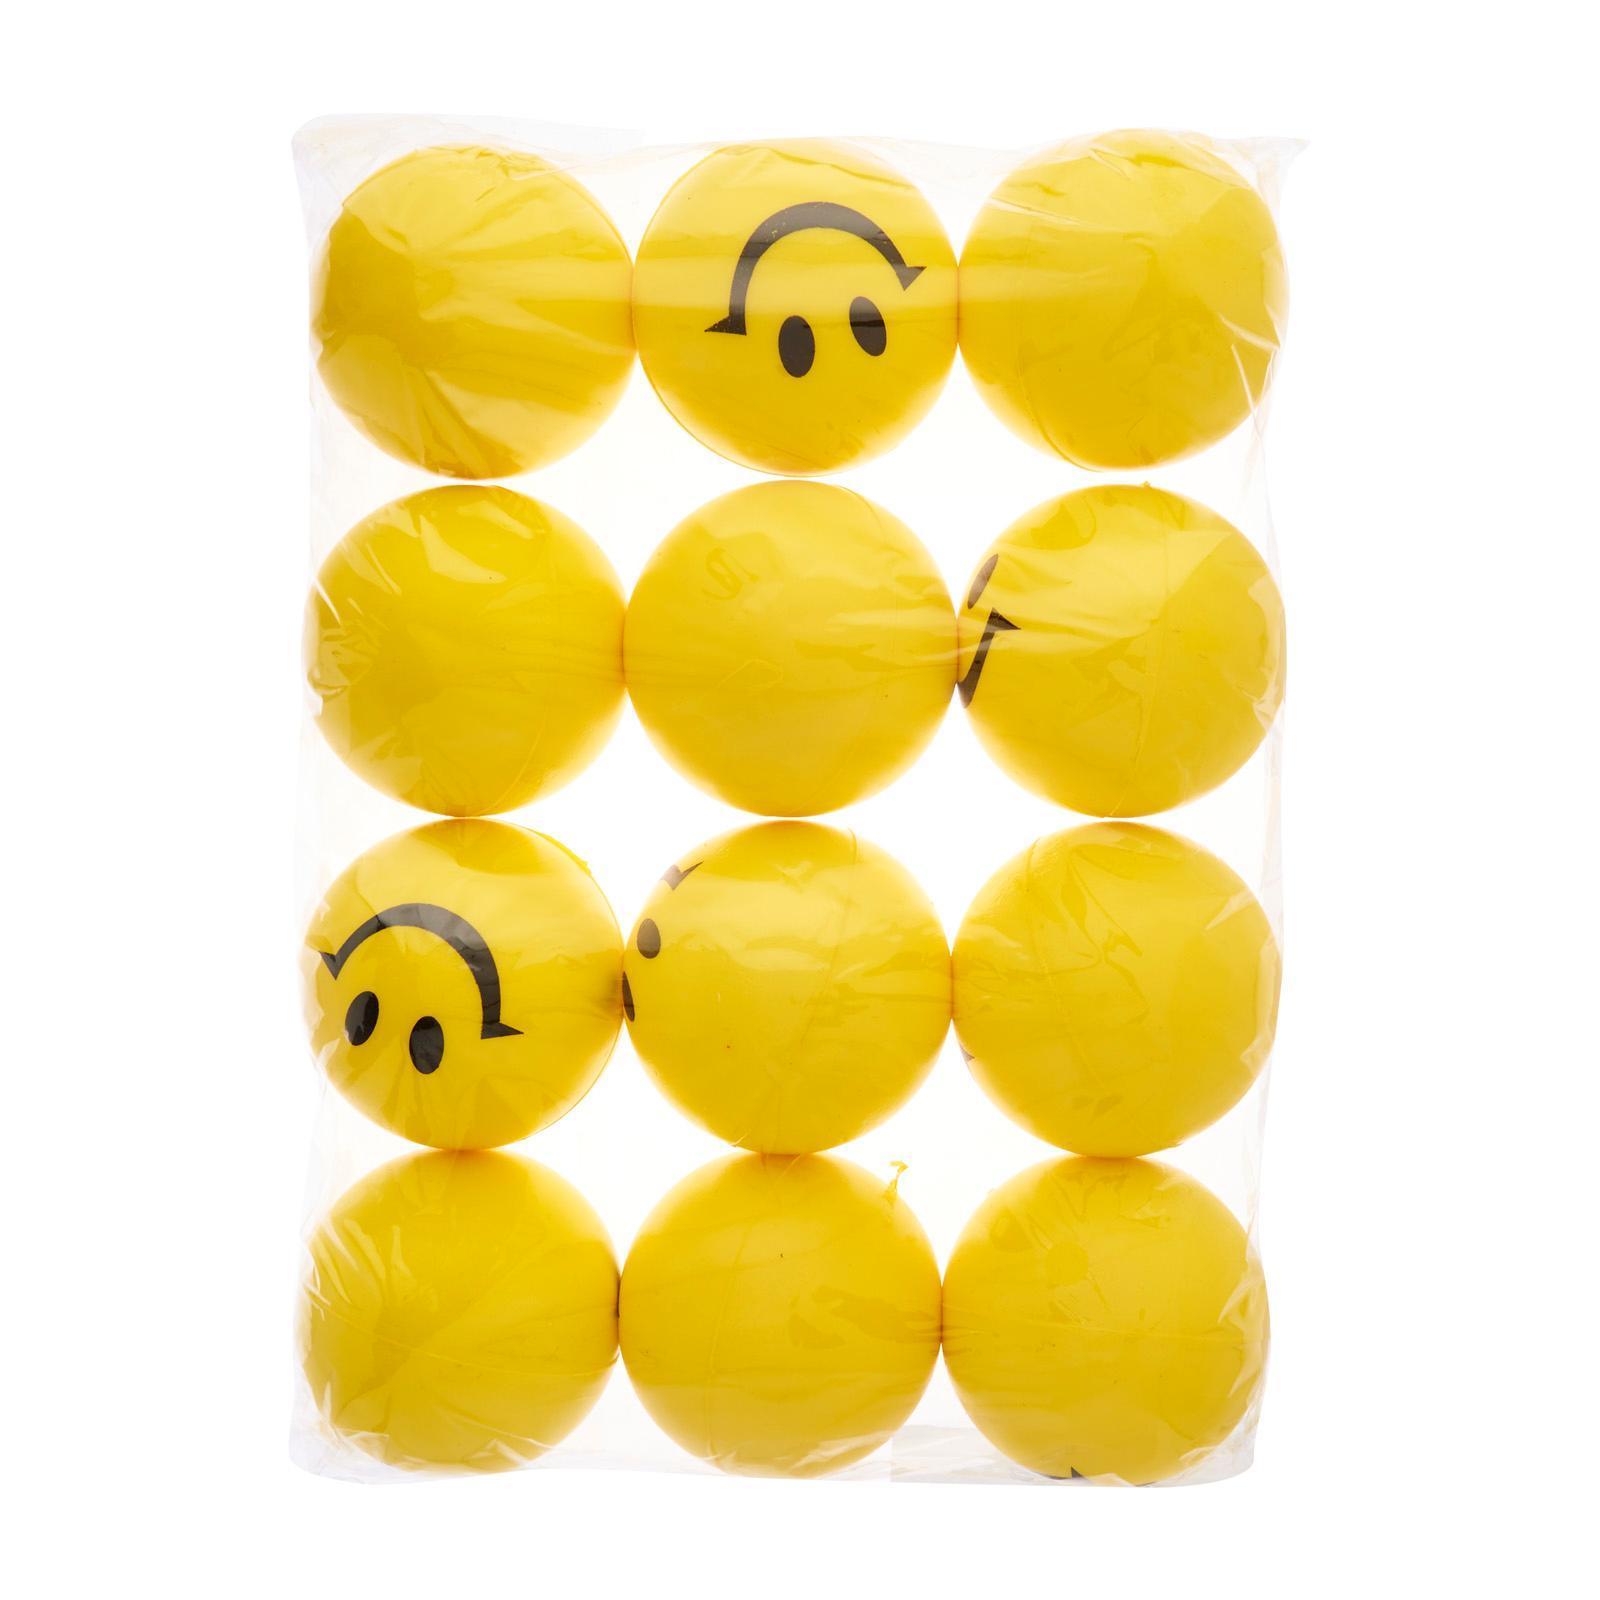 CGS 6Cm Smiley Stress Balls (Yellow) (12Pcs) - Party Favor